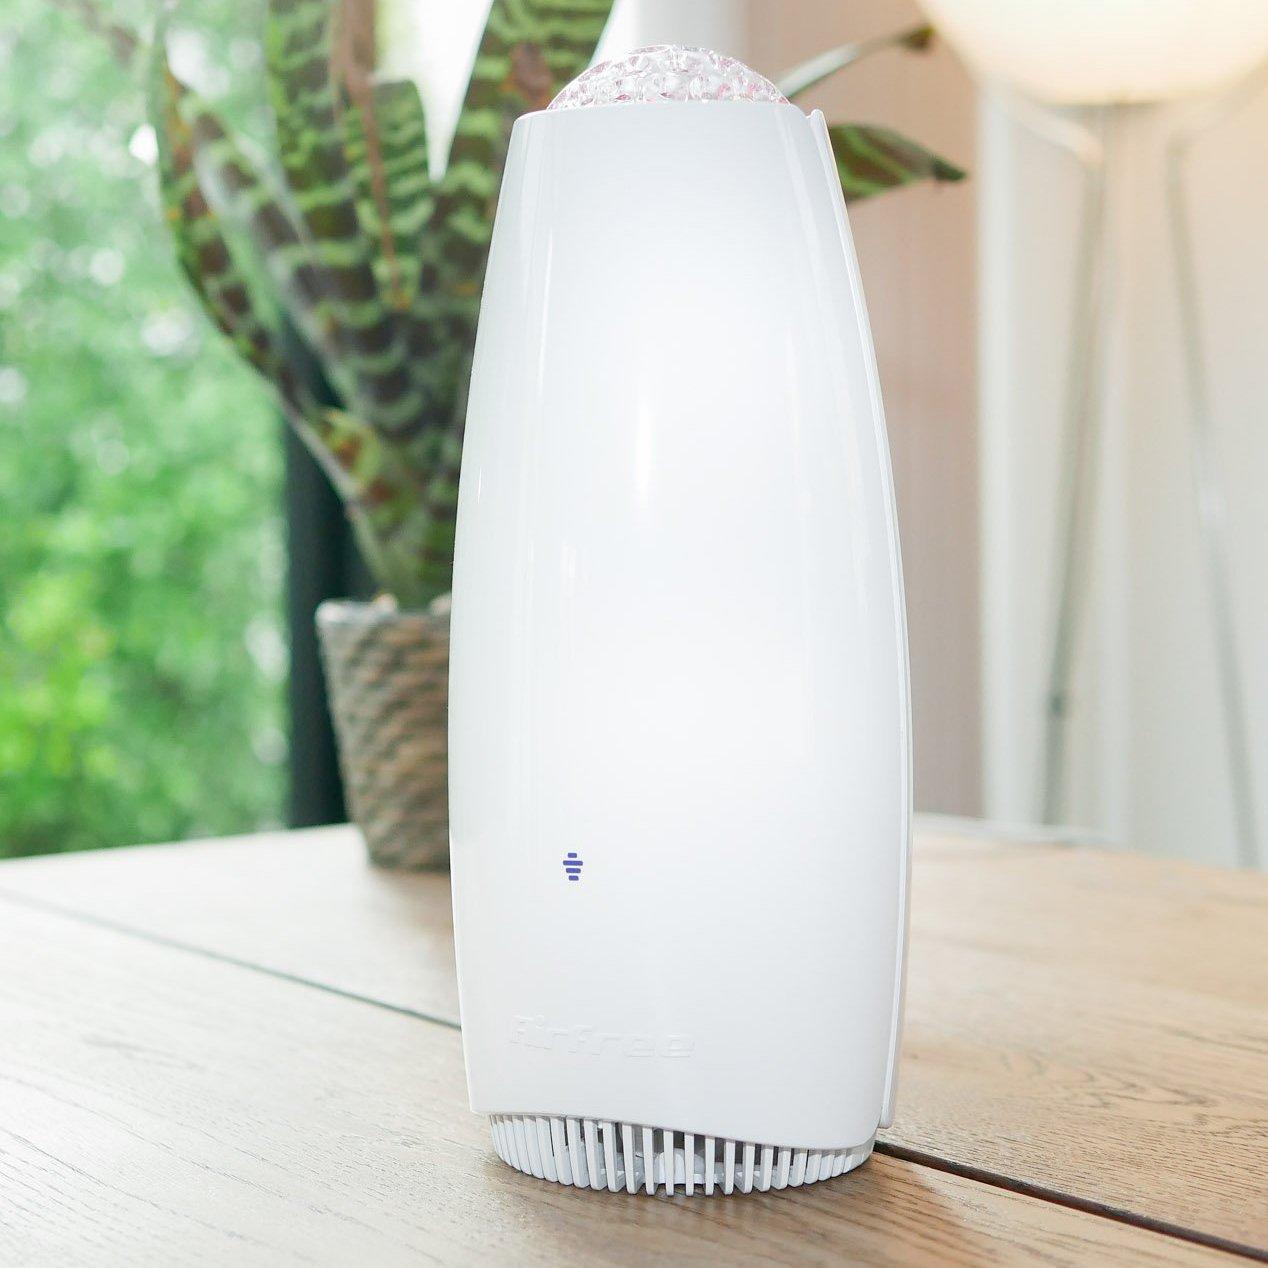 Airfree Tulip Filterless Silent Air Purifier